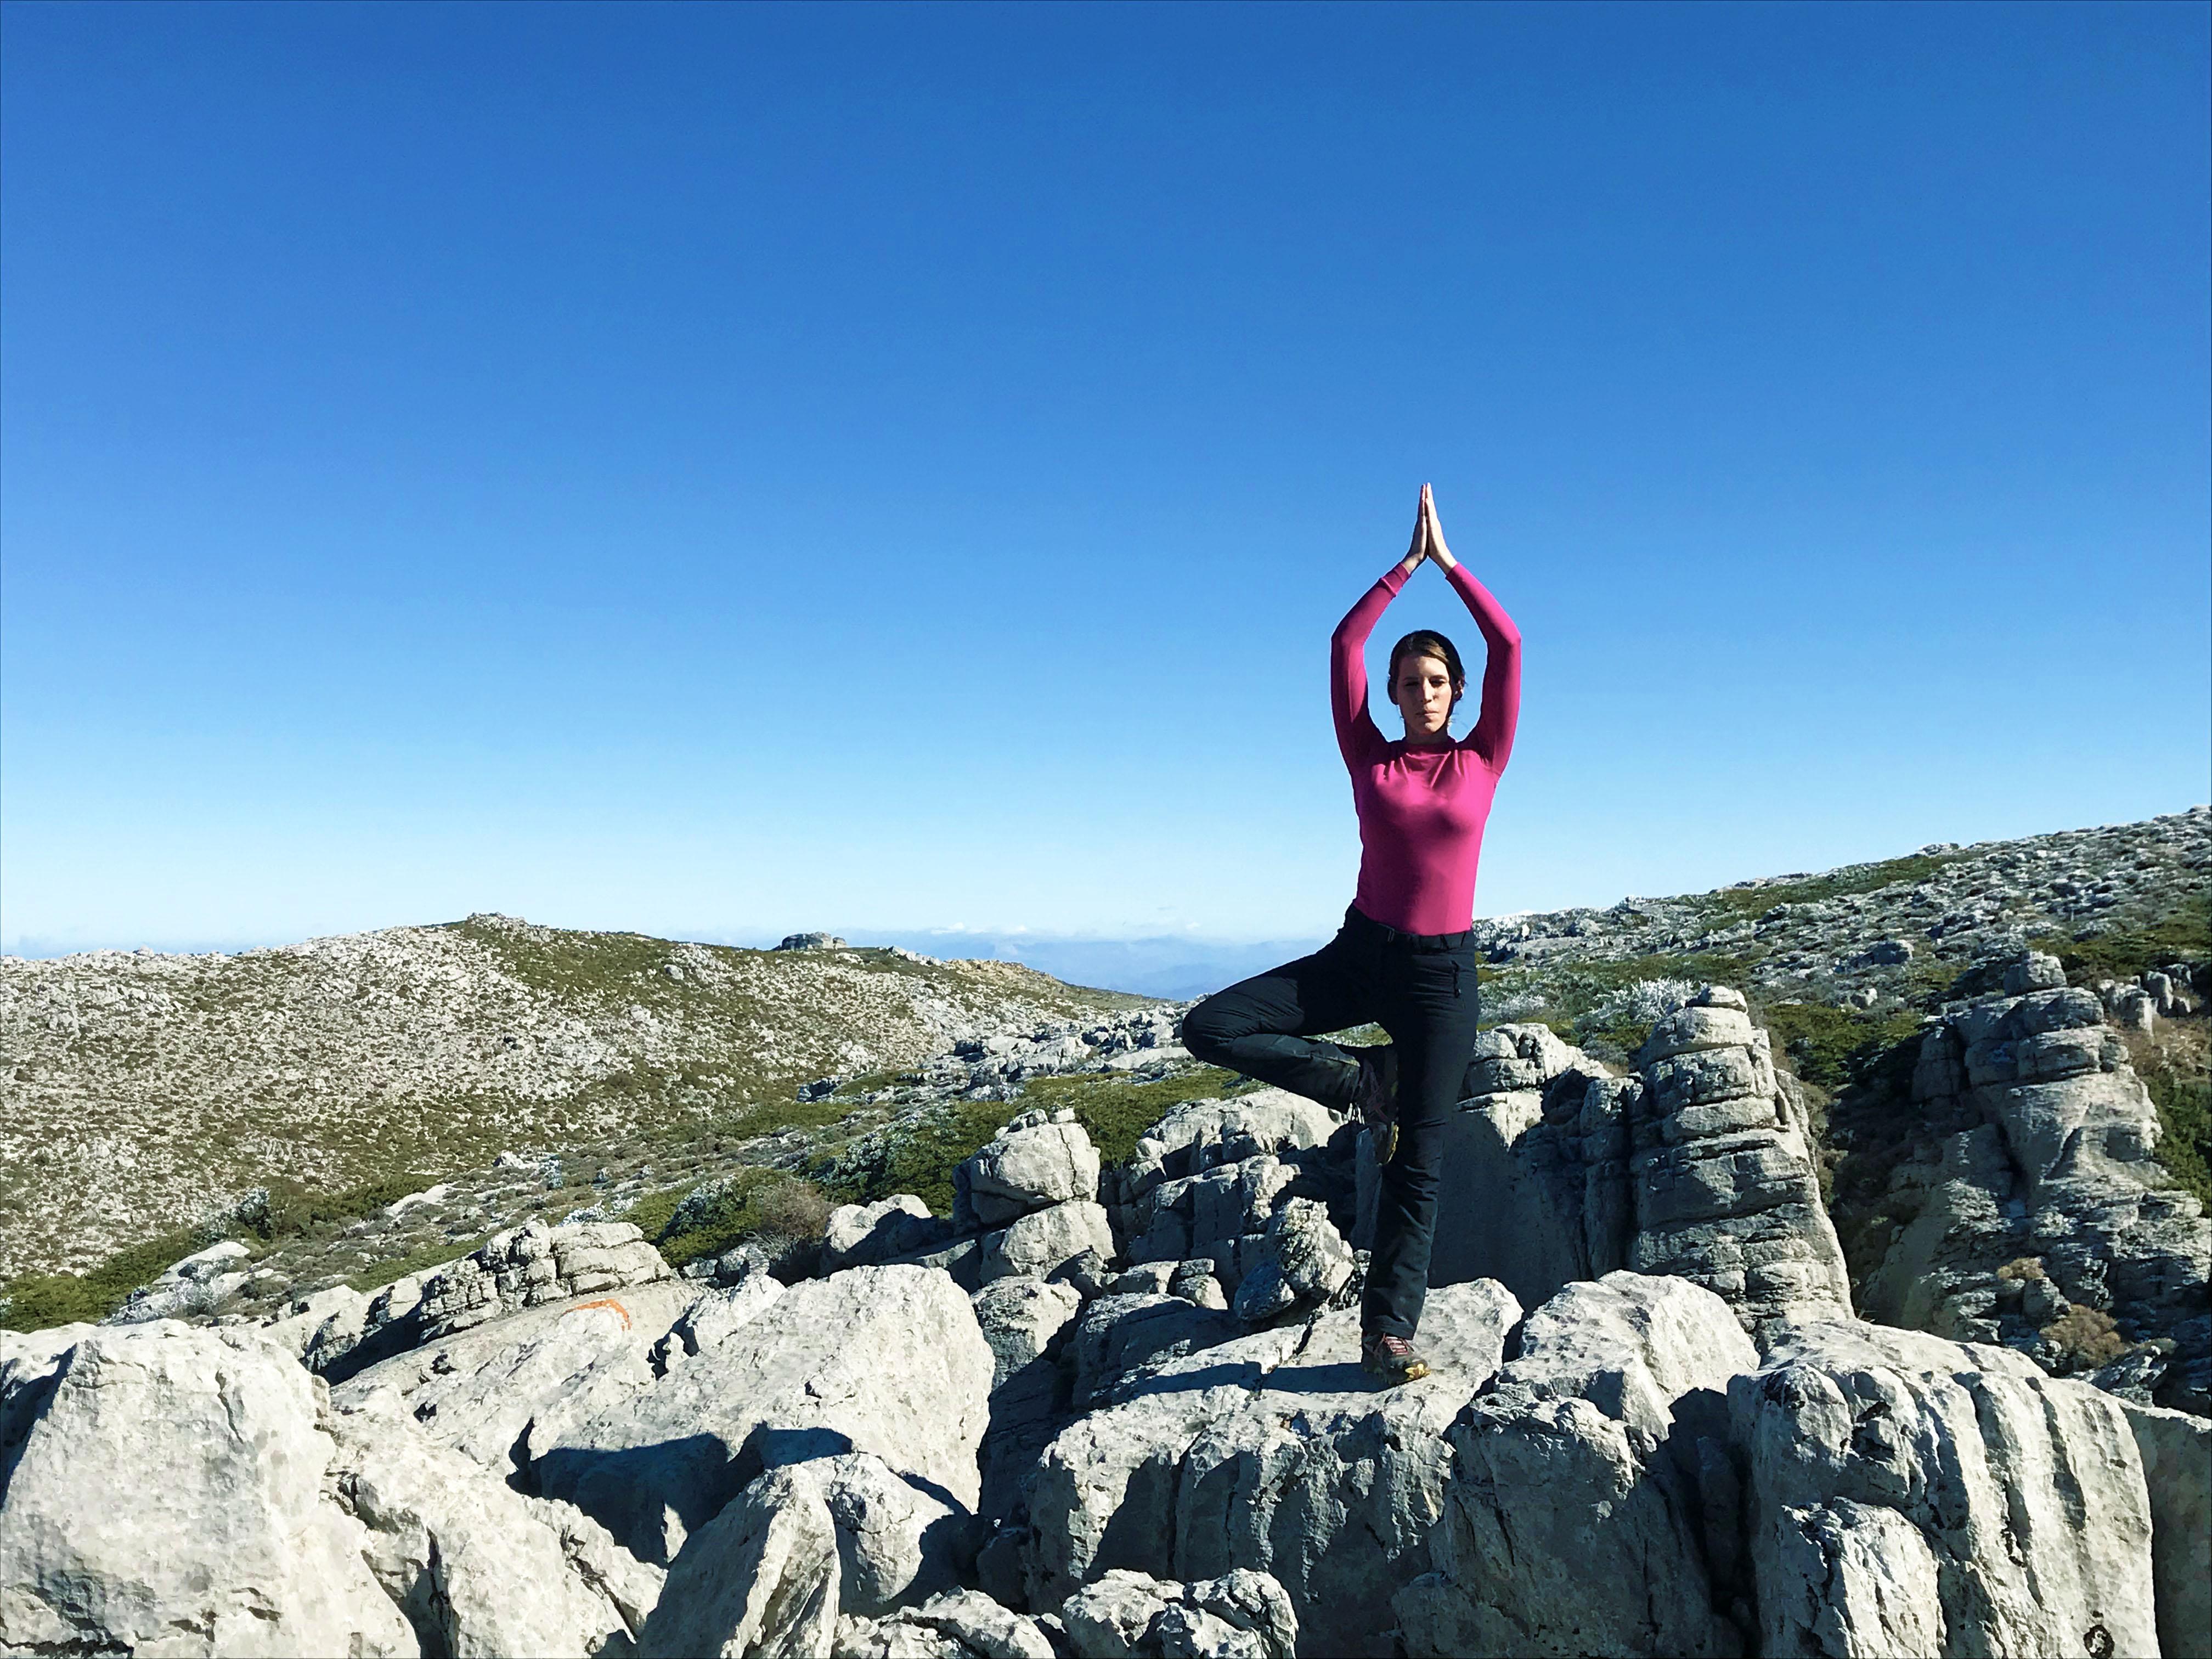 El Árbol - Vrksana Yoga